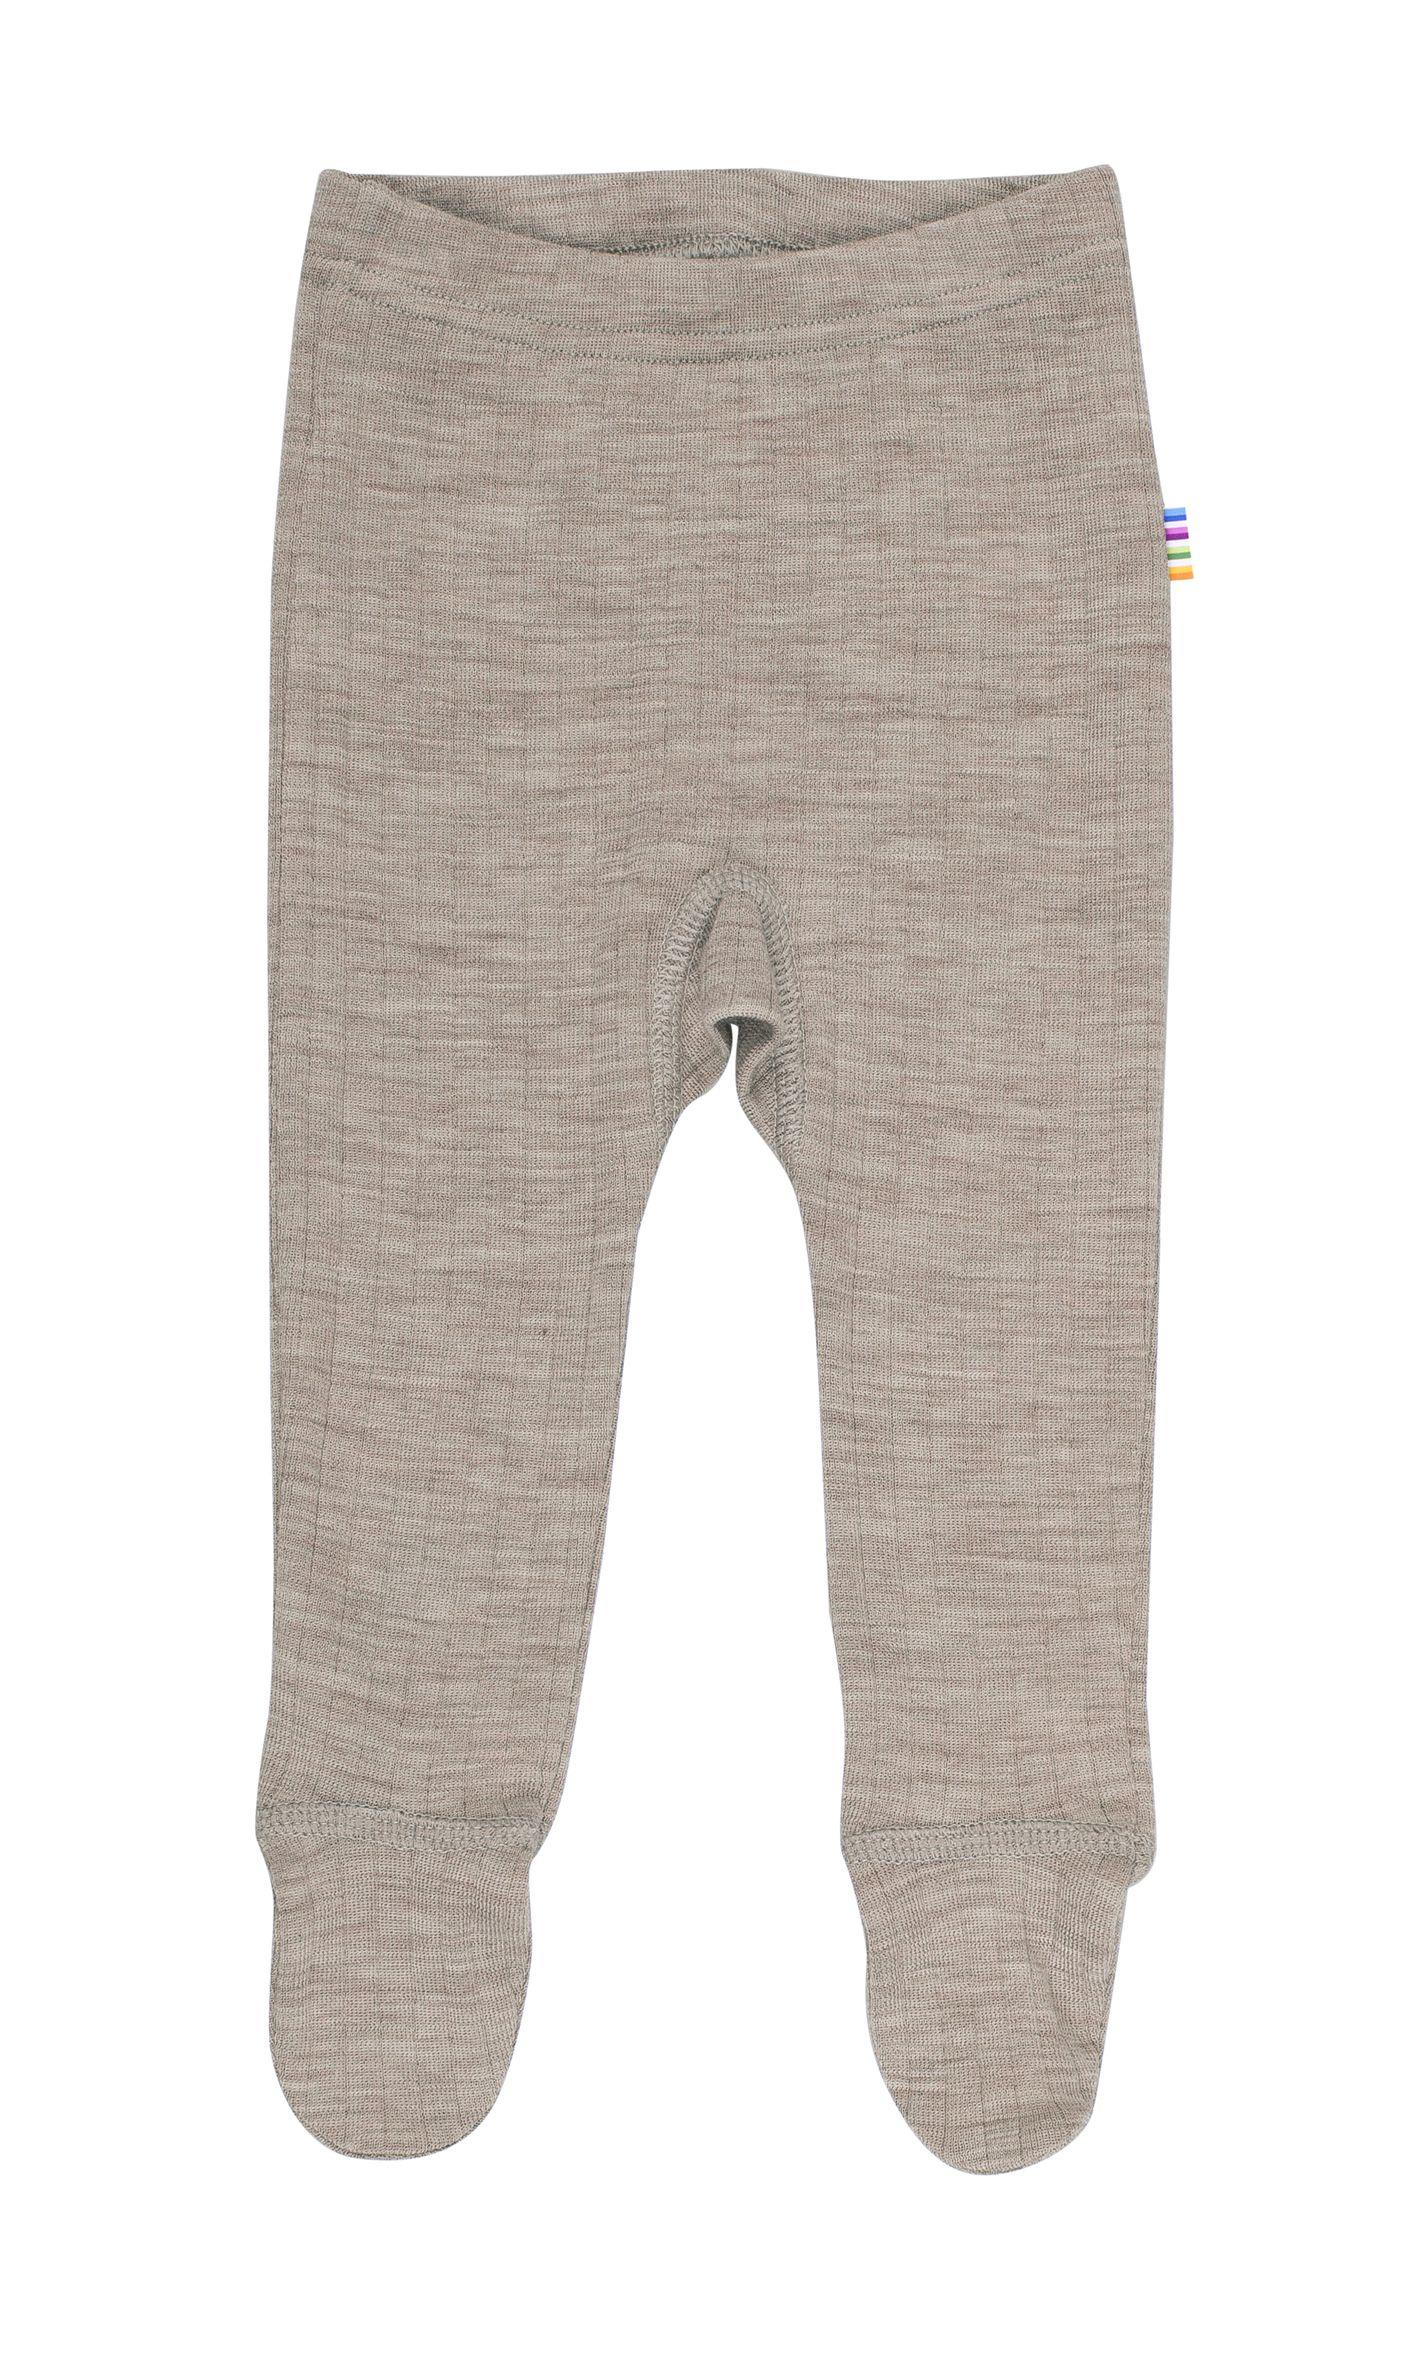 Image of   Leggings m. fod fra Joha i uld i Sesame Melange